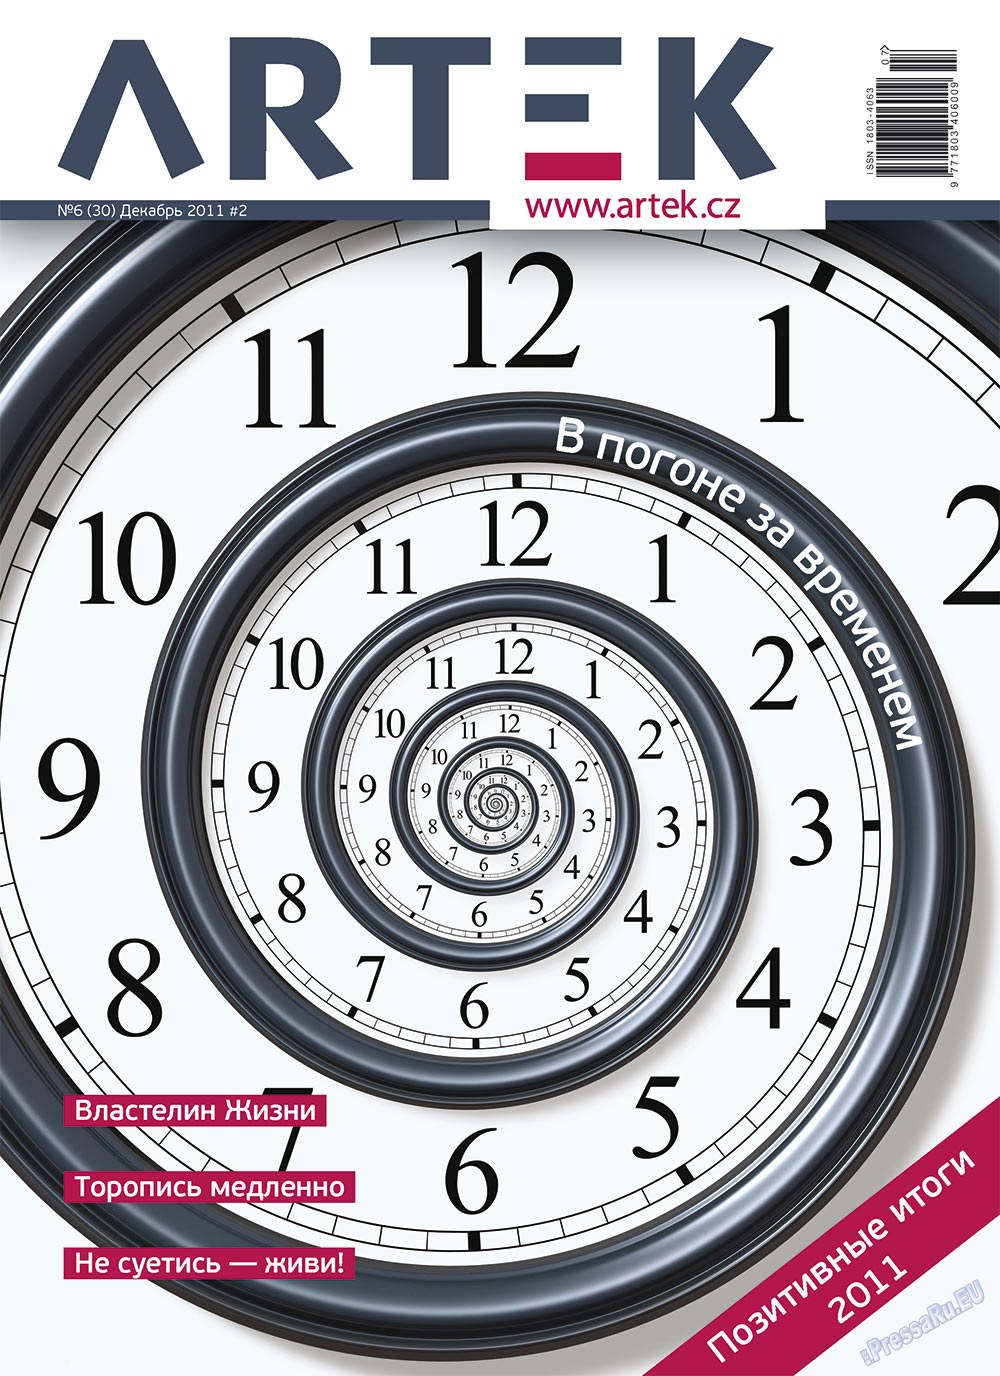 Артек (журнал). 2011 год, номер 6, стр. 1